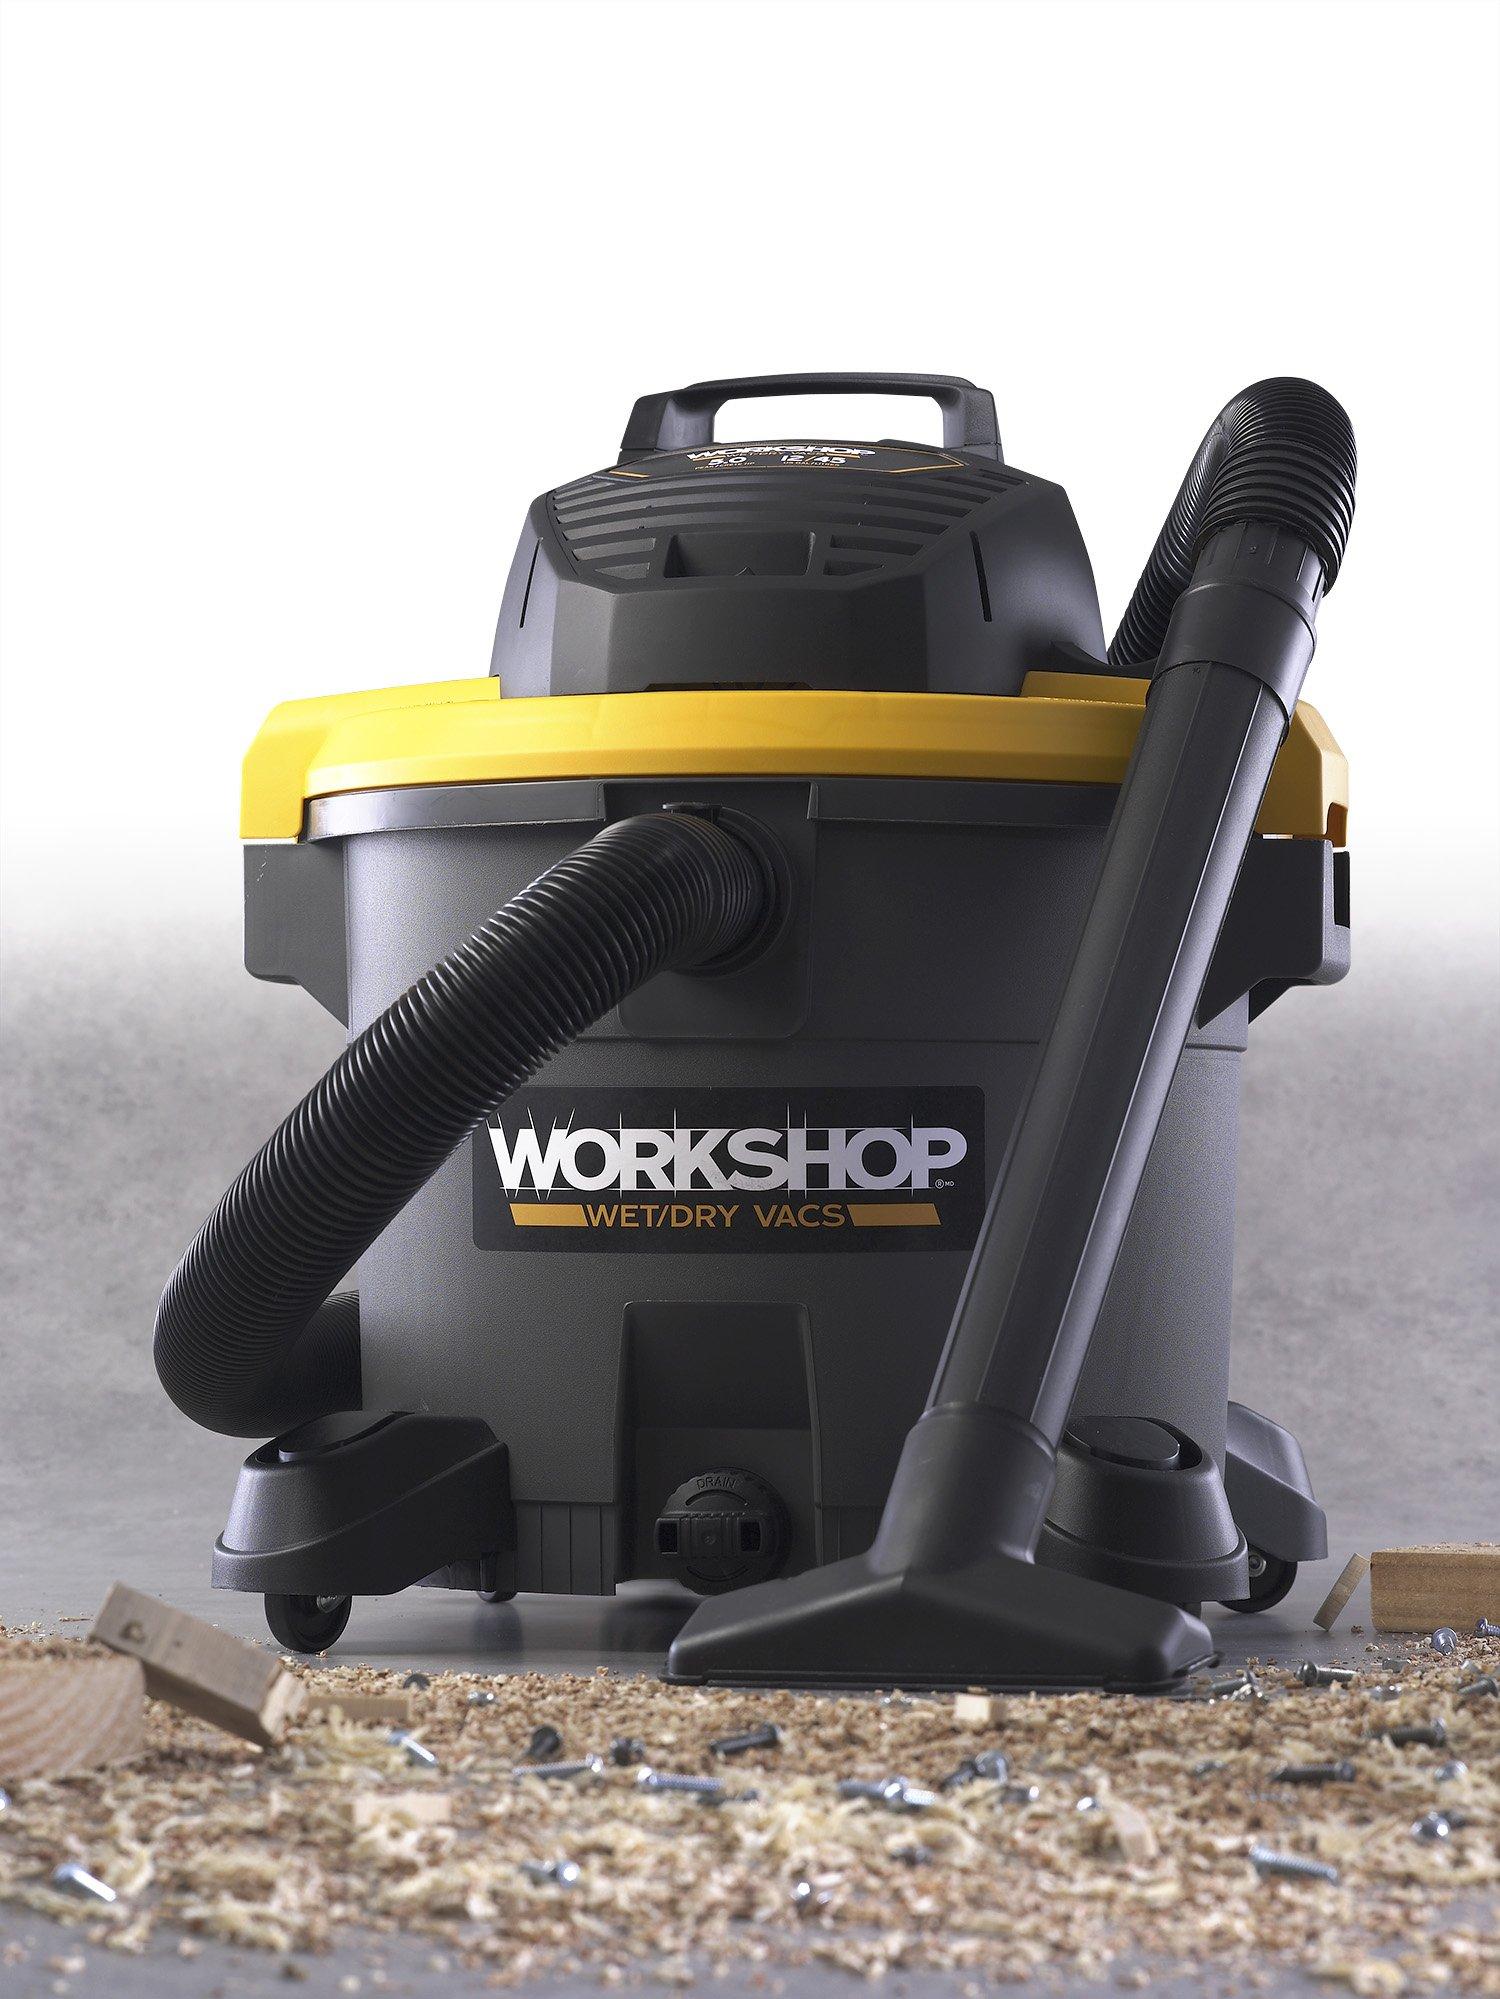 WORKSHOP Wet Dry Vac WS1200VA Heavy Duty General Purpose Wet Dry Vacuum Cleaner, 12-Gallon Shop Vacuum Cleaner, 5.0 Peak HP Wet And Dry Vacuum by Workshop (Image #2)